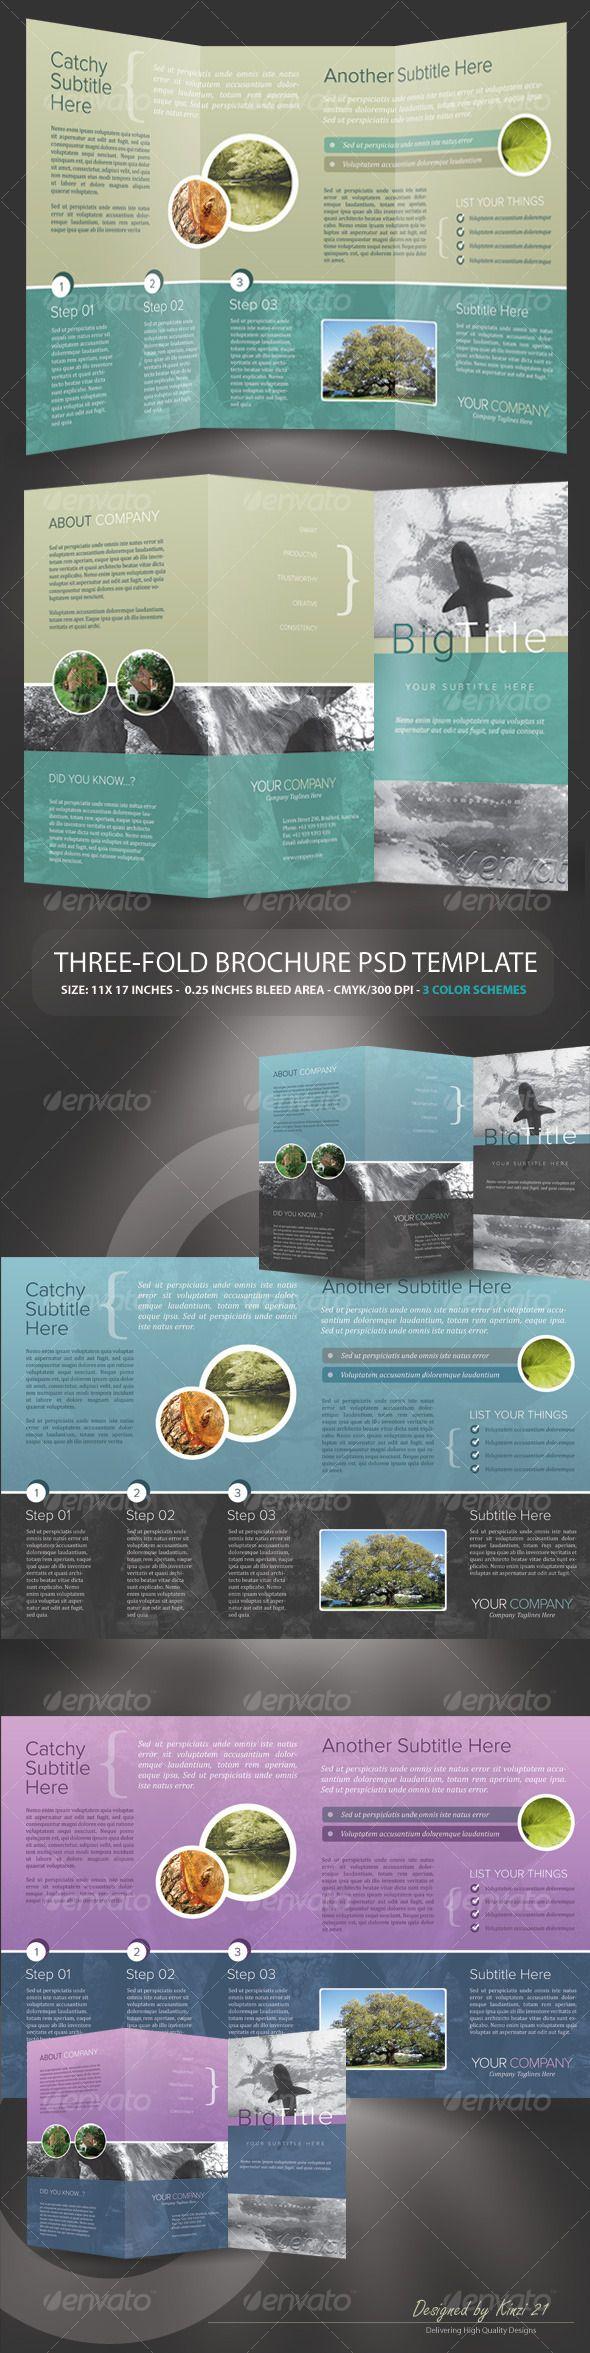 Printable Tri Fold Brochure Template 7 Best Flyersbrochures Images On Pinterest  Business Flyers .